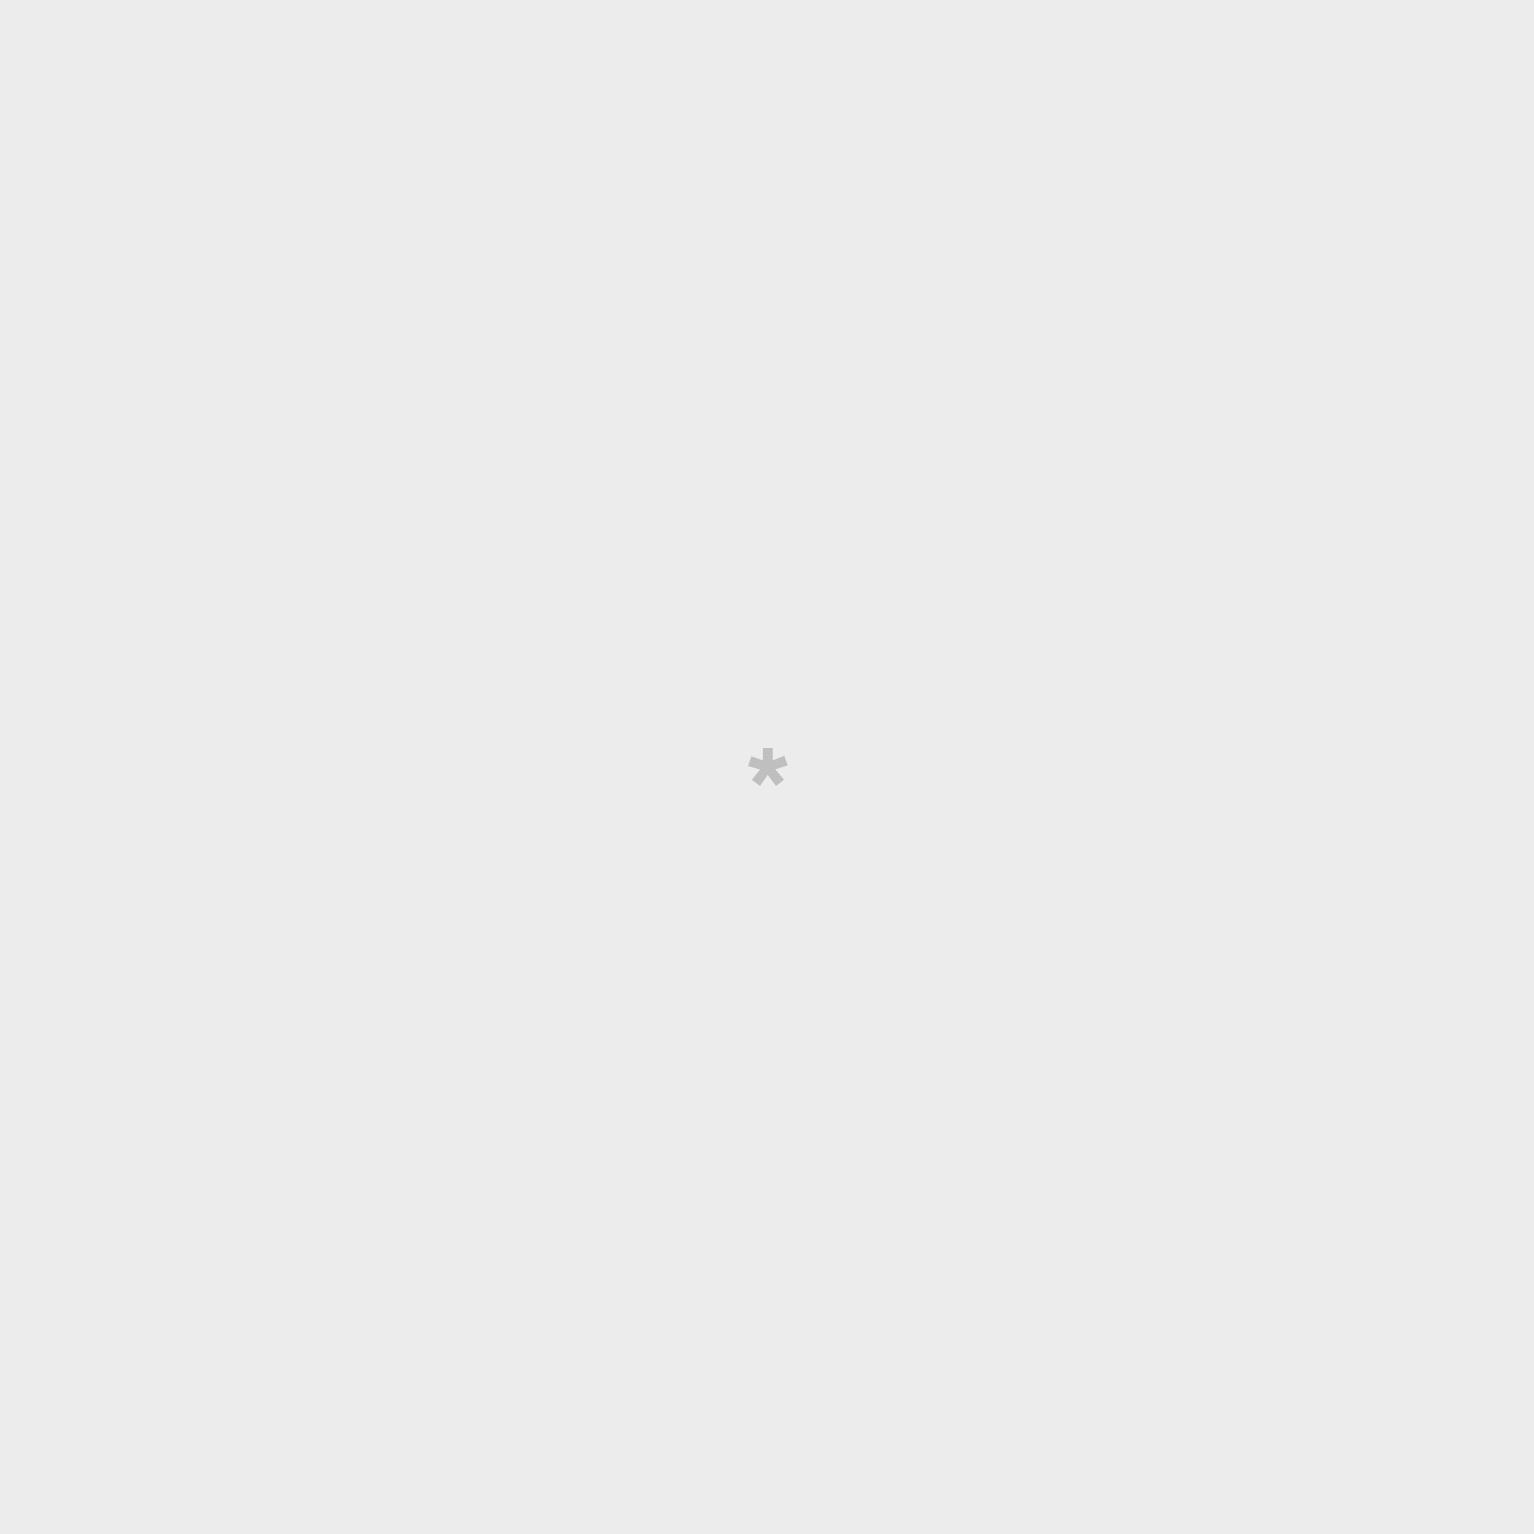 Caja con álbum de fotos - Todos esos momentos tan tuyos y míosCaja con álbum de fotos - Todos esos momentos tan tuyos y míos